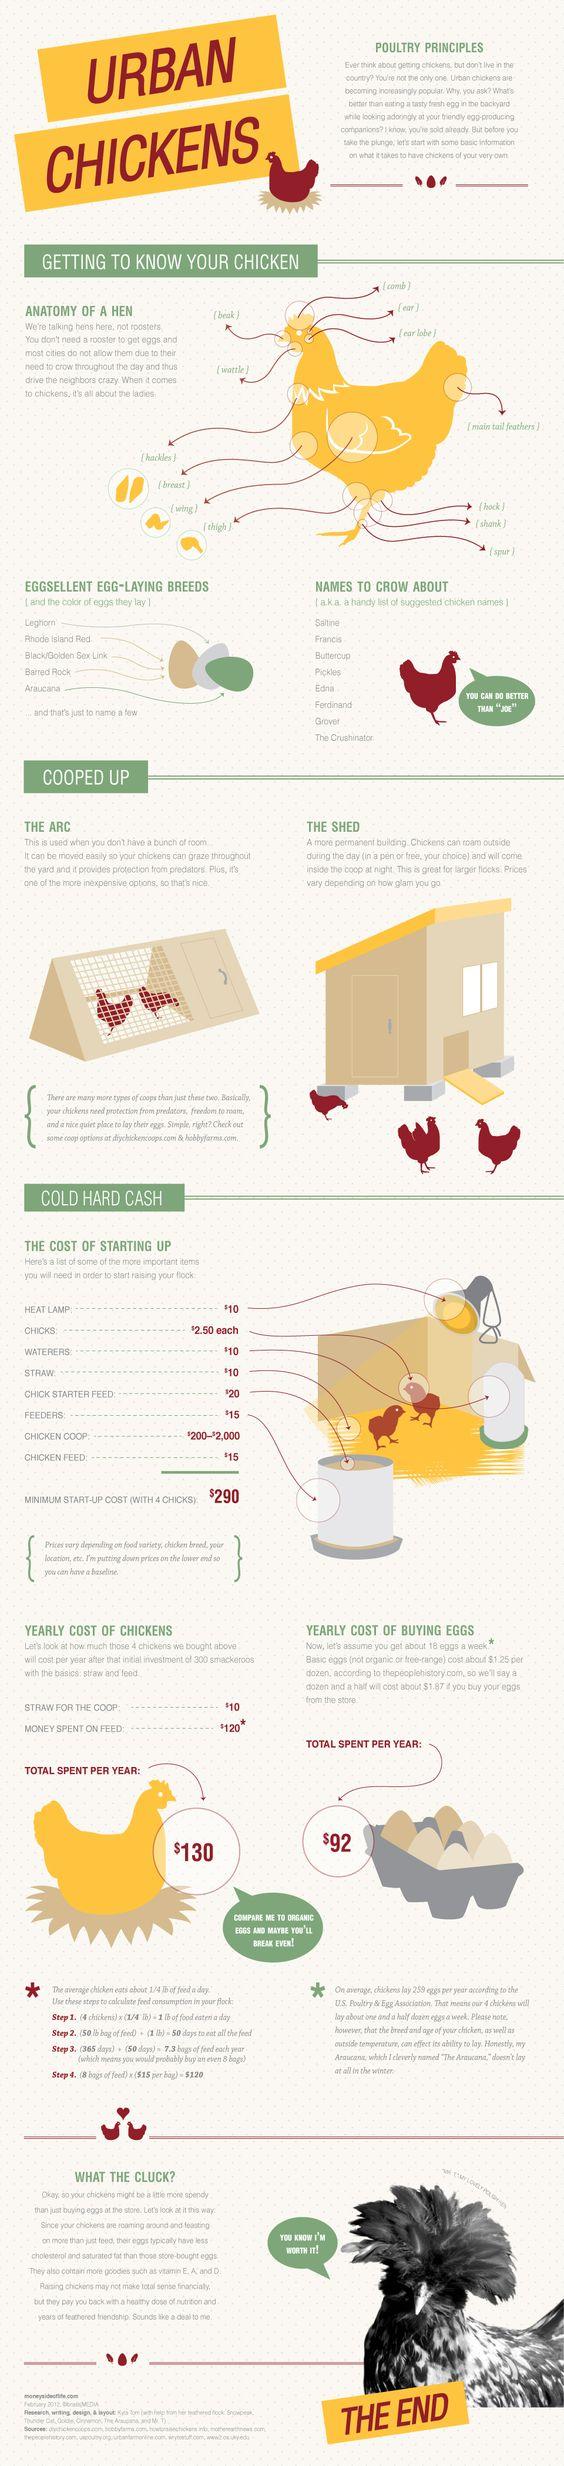 Raising chickens.